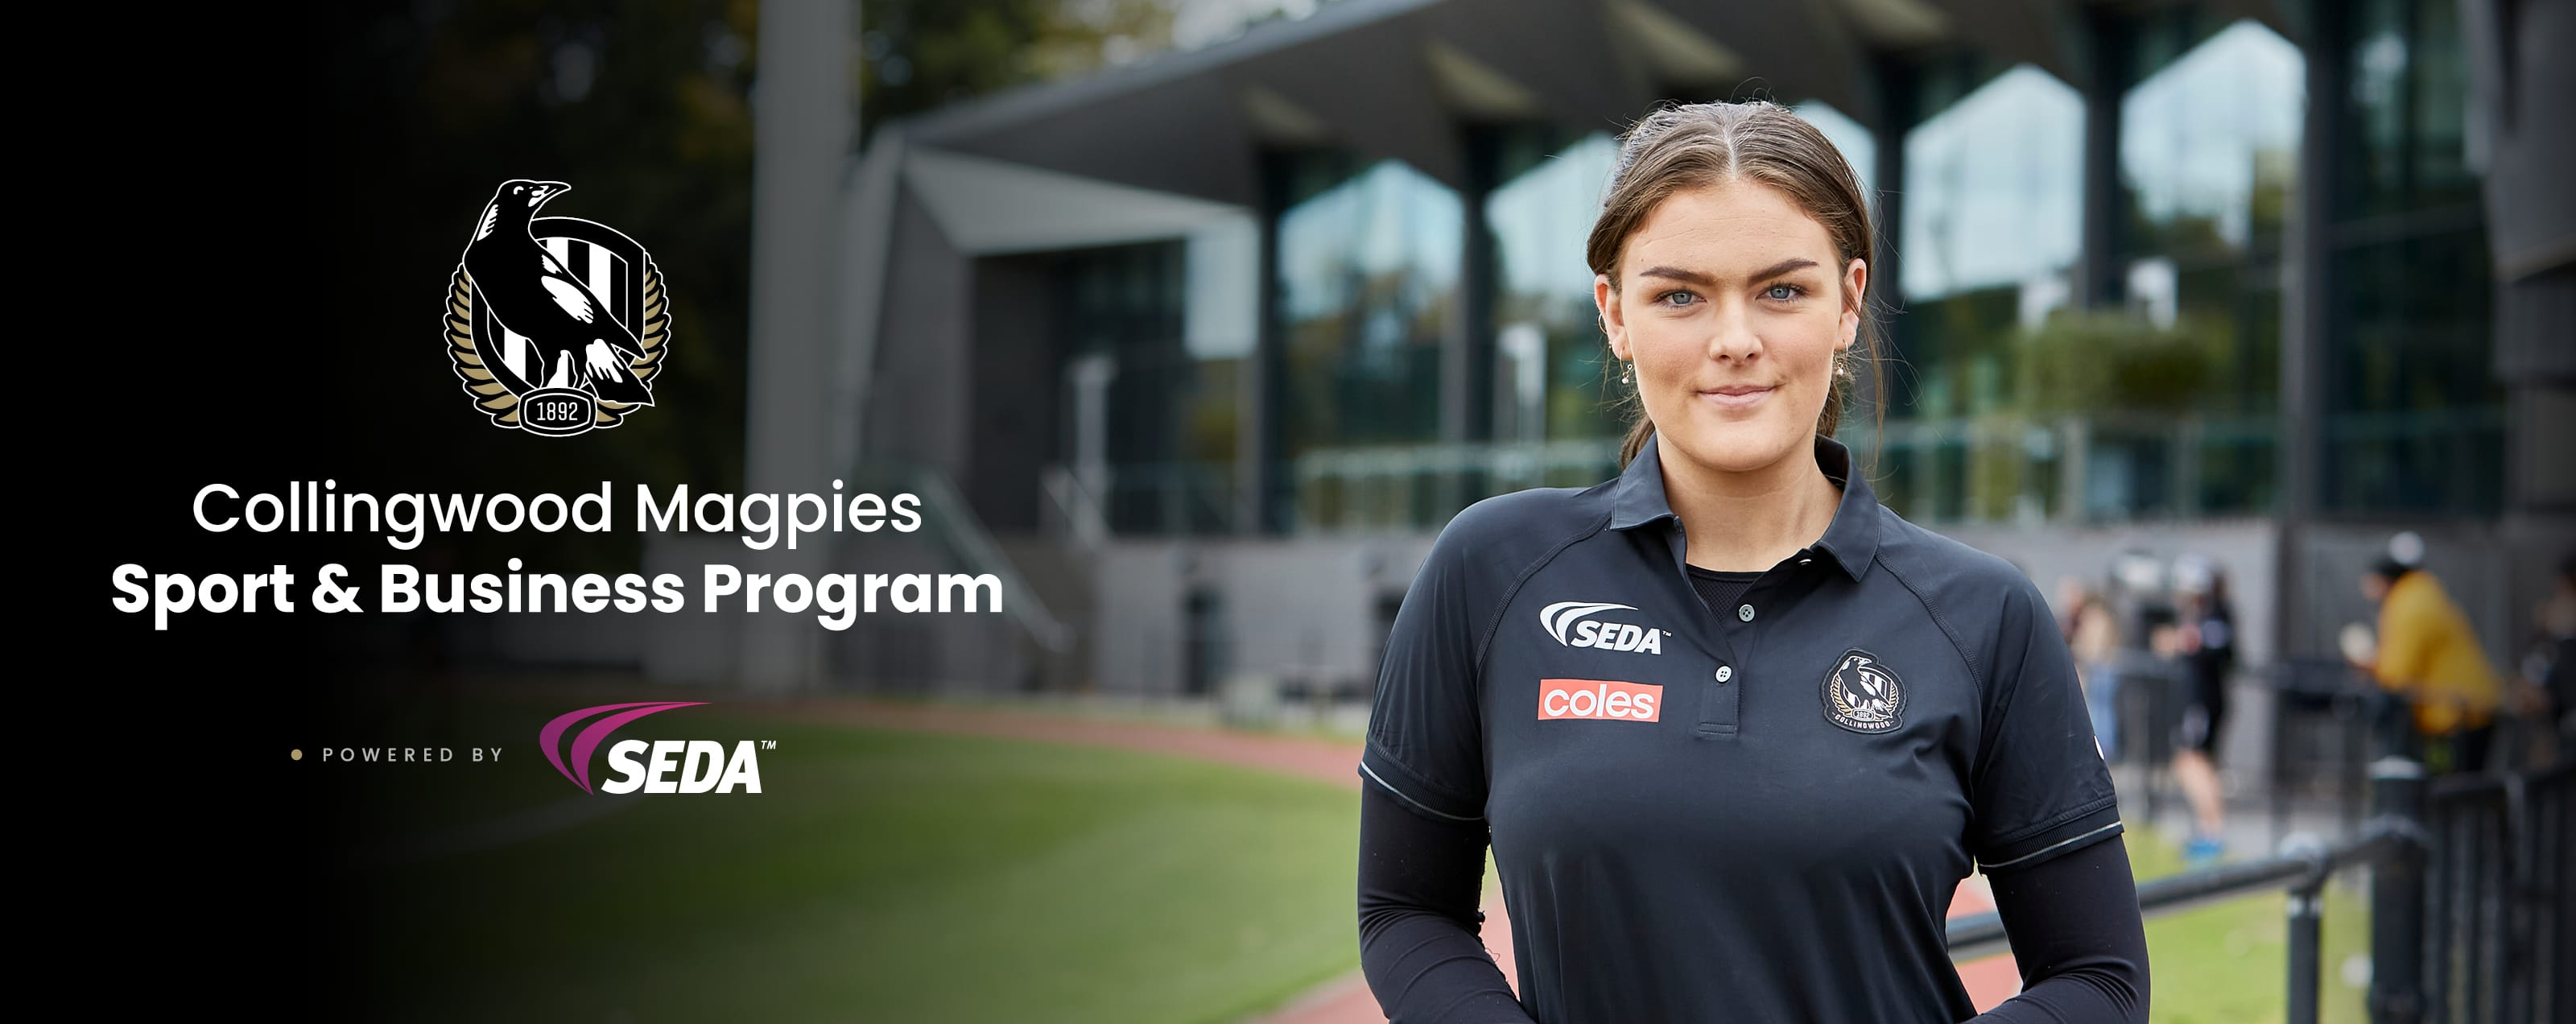 SEDA Sport & Business Program